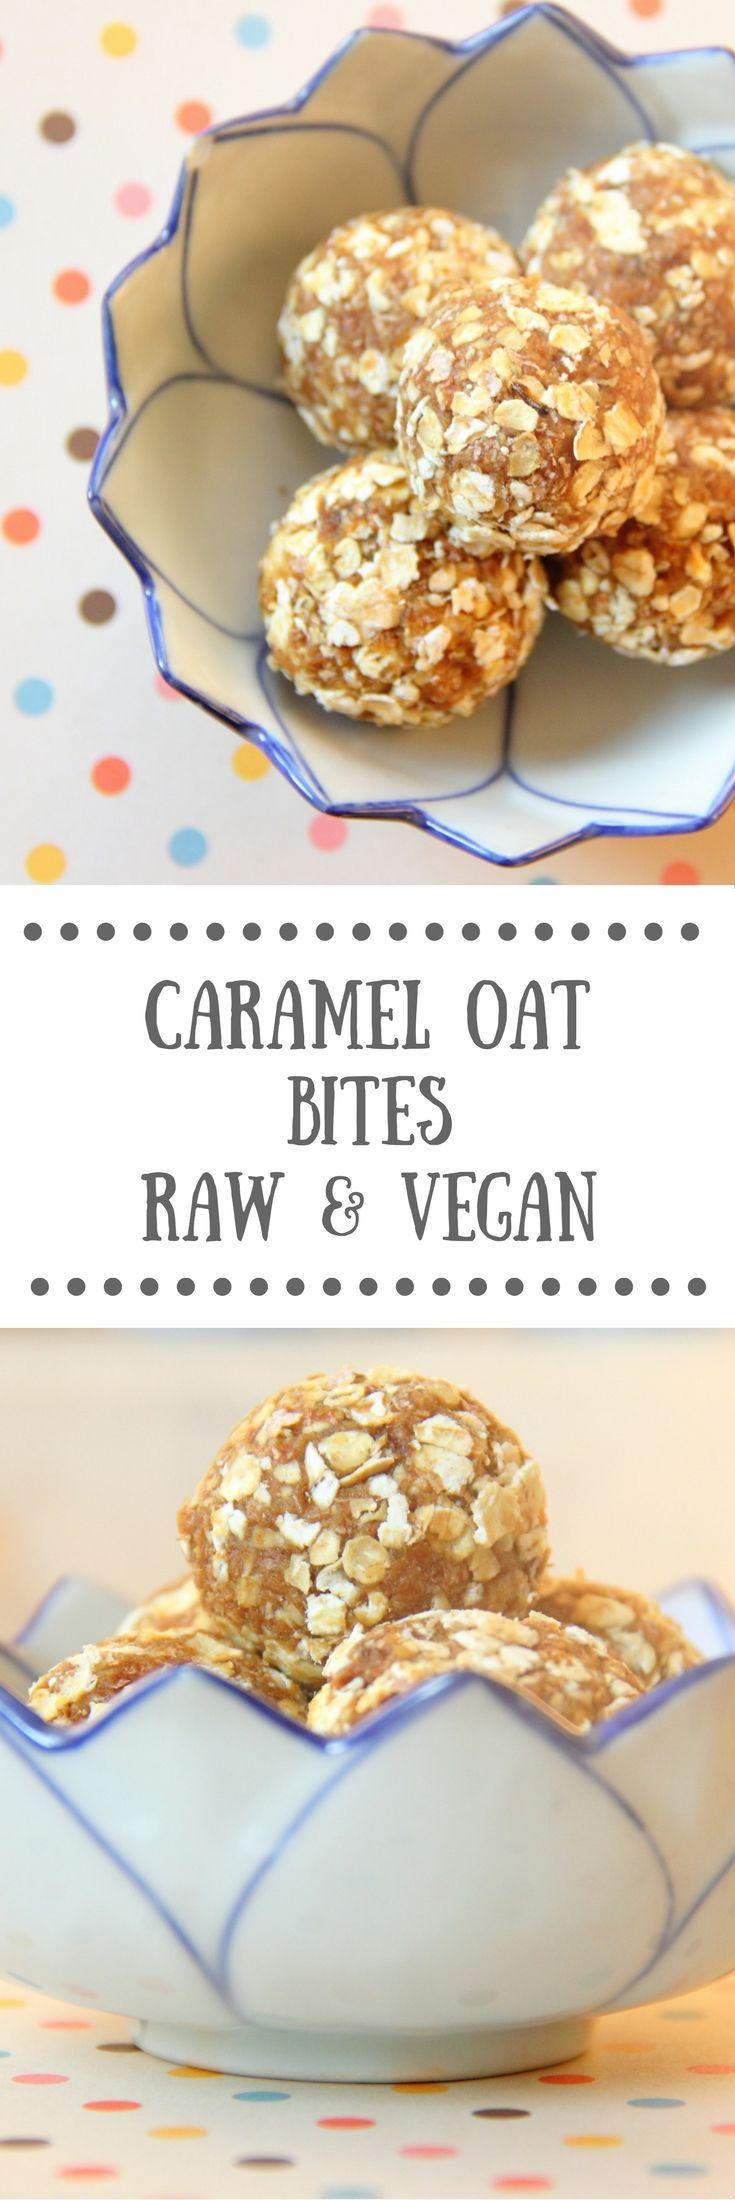 3463 best vegan favorites images on pinterest caramel oat bites easy vegan bliss balls recipe forumfinder Image collections